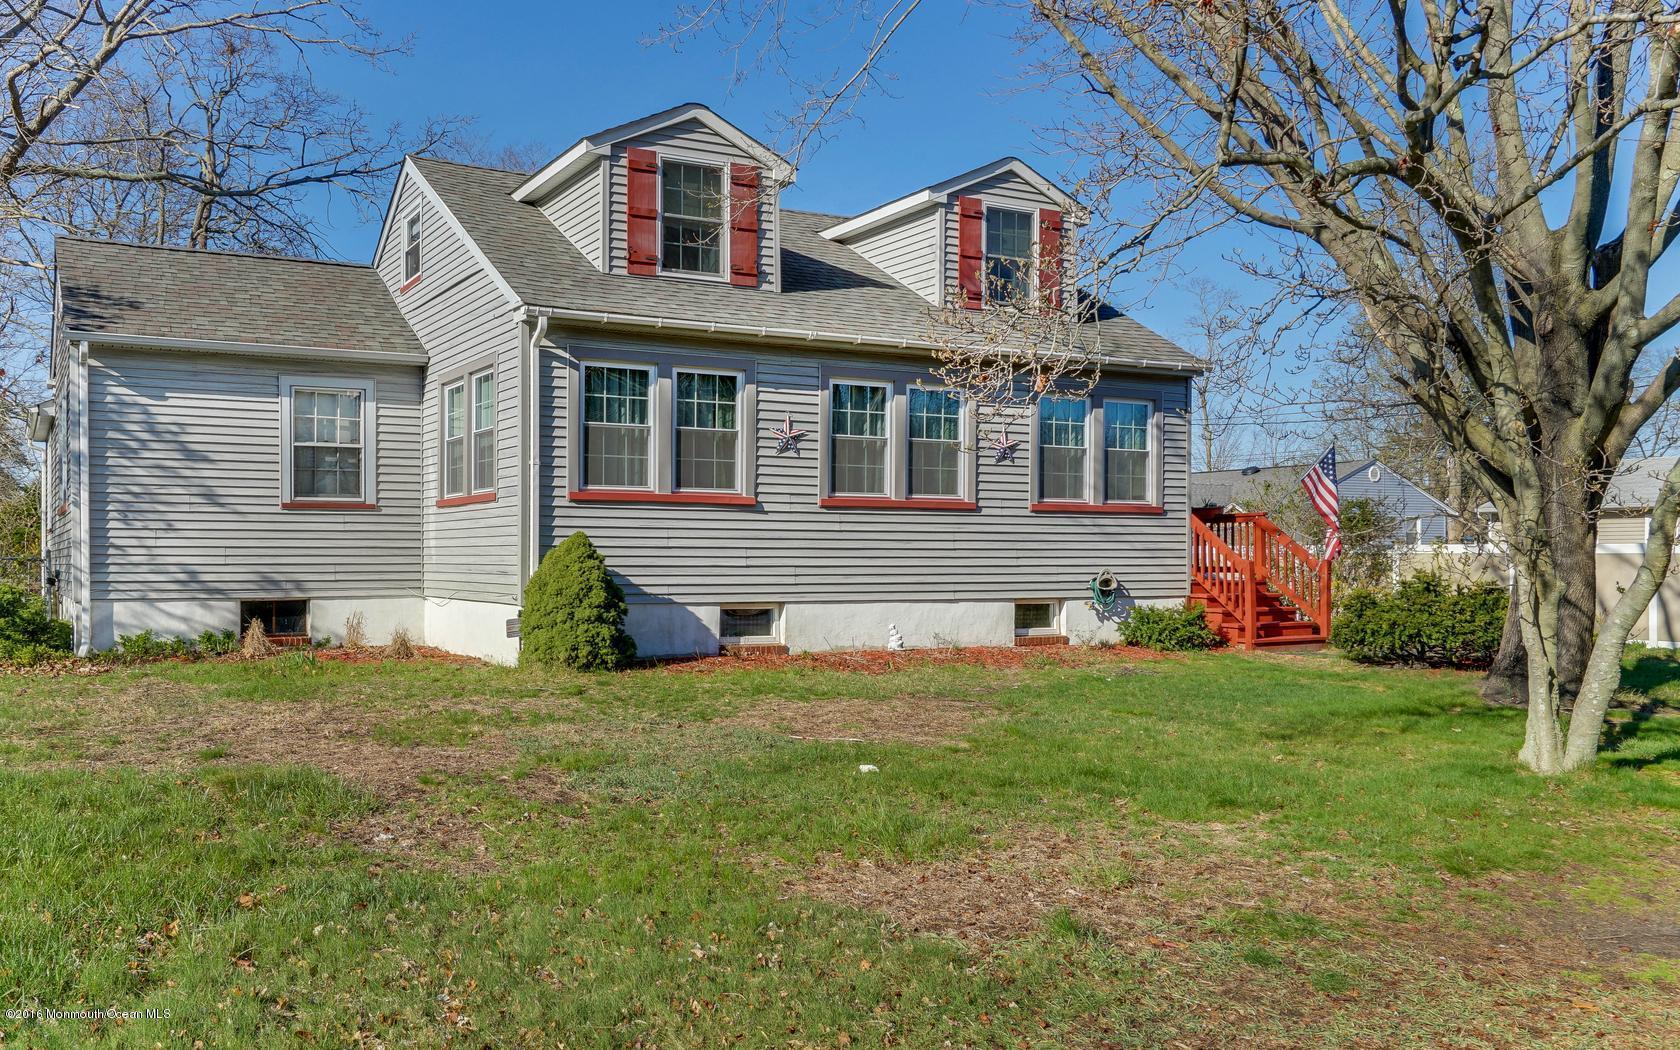 Photo of home for sale at 67 Chestnut Street Street, Beachwood NJ